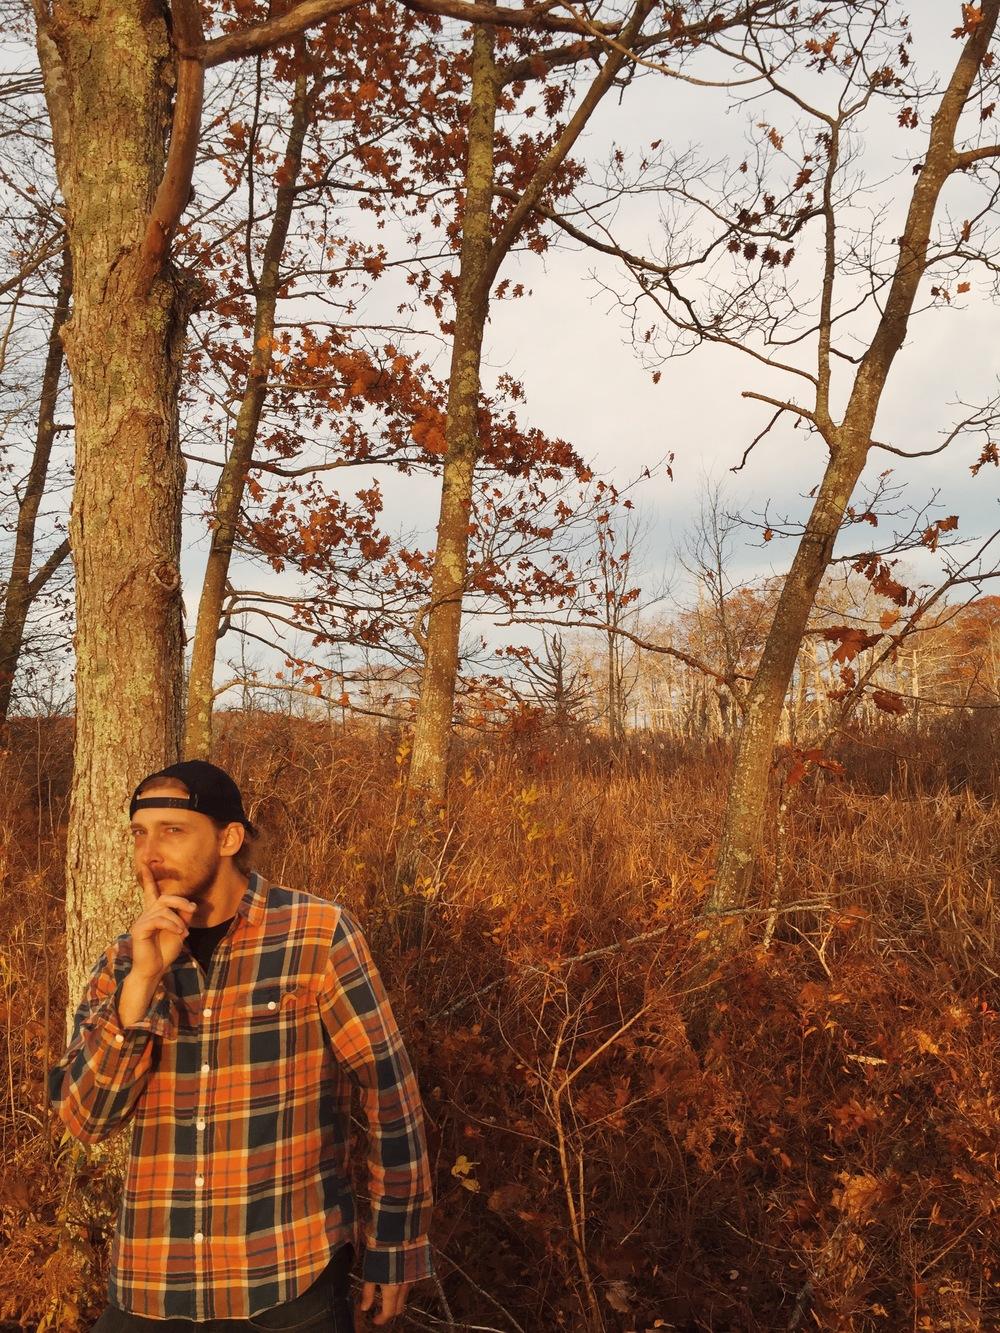 Deer Season Hiking Attire, Cliff Kuhn-Lloyd